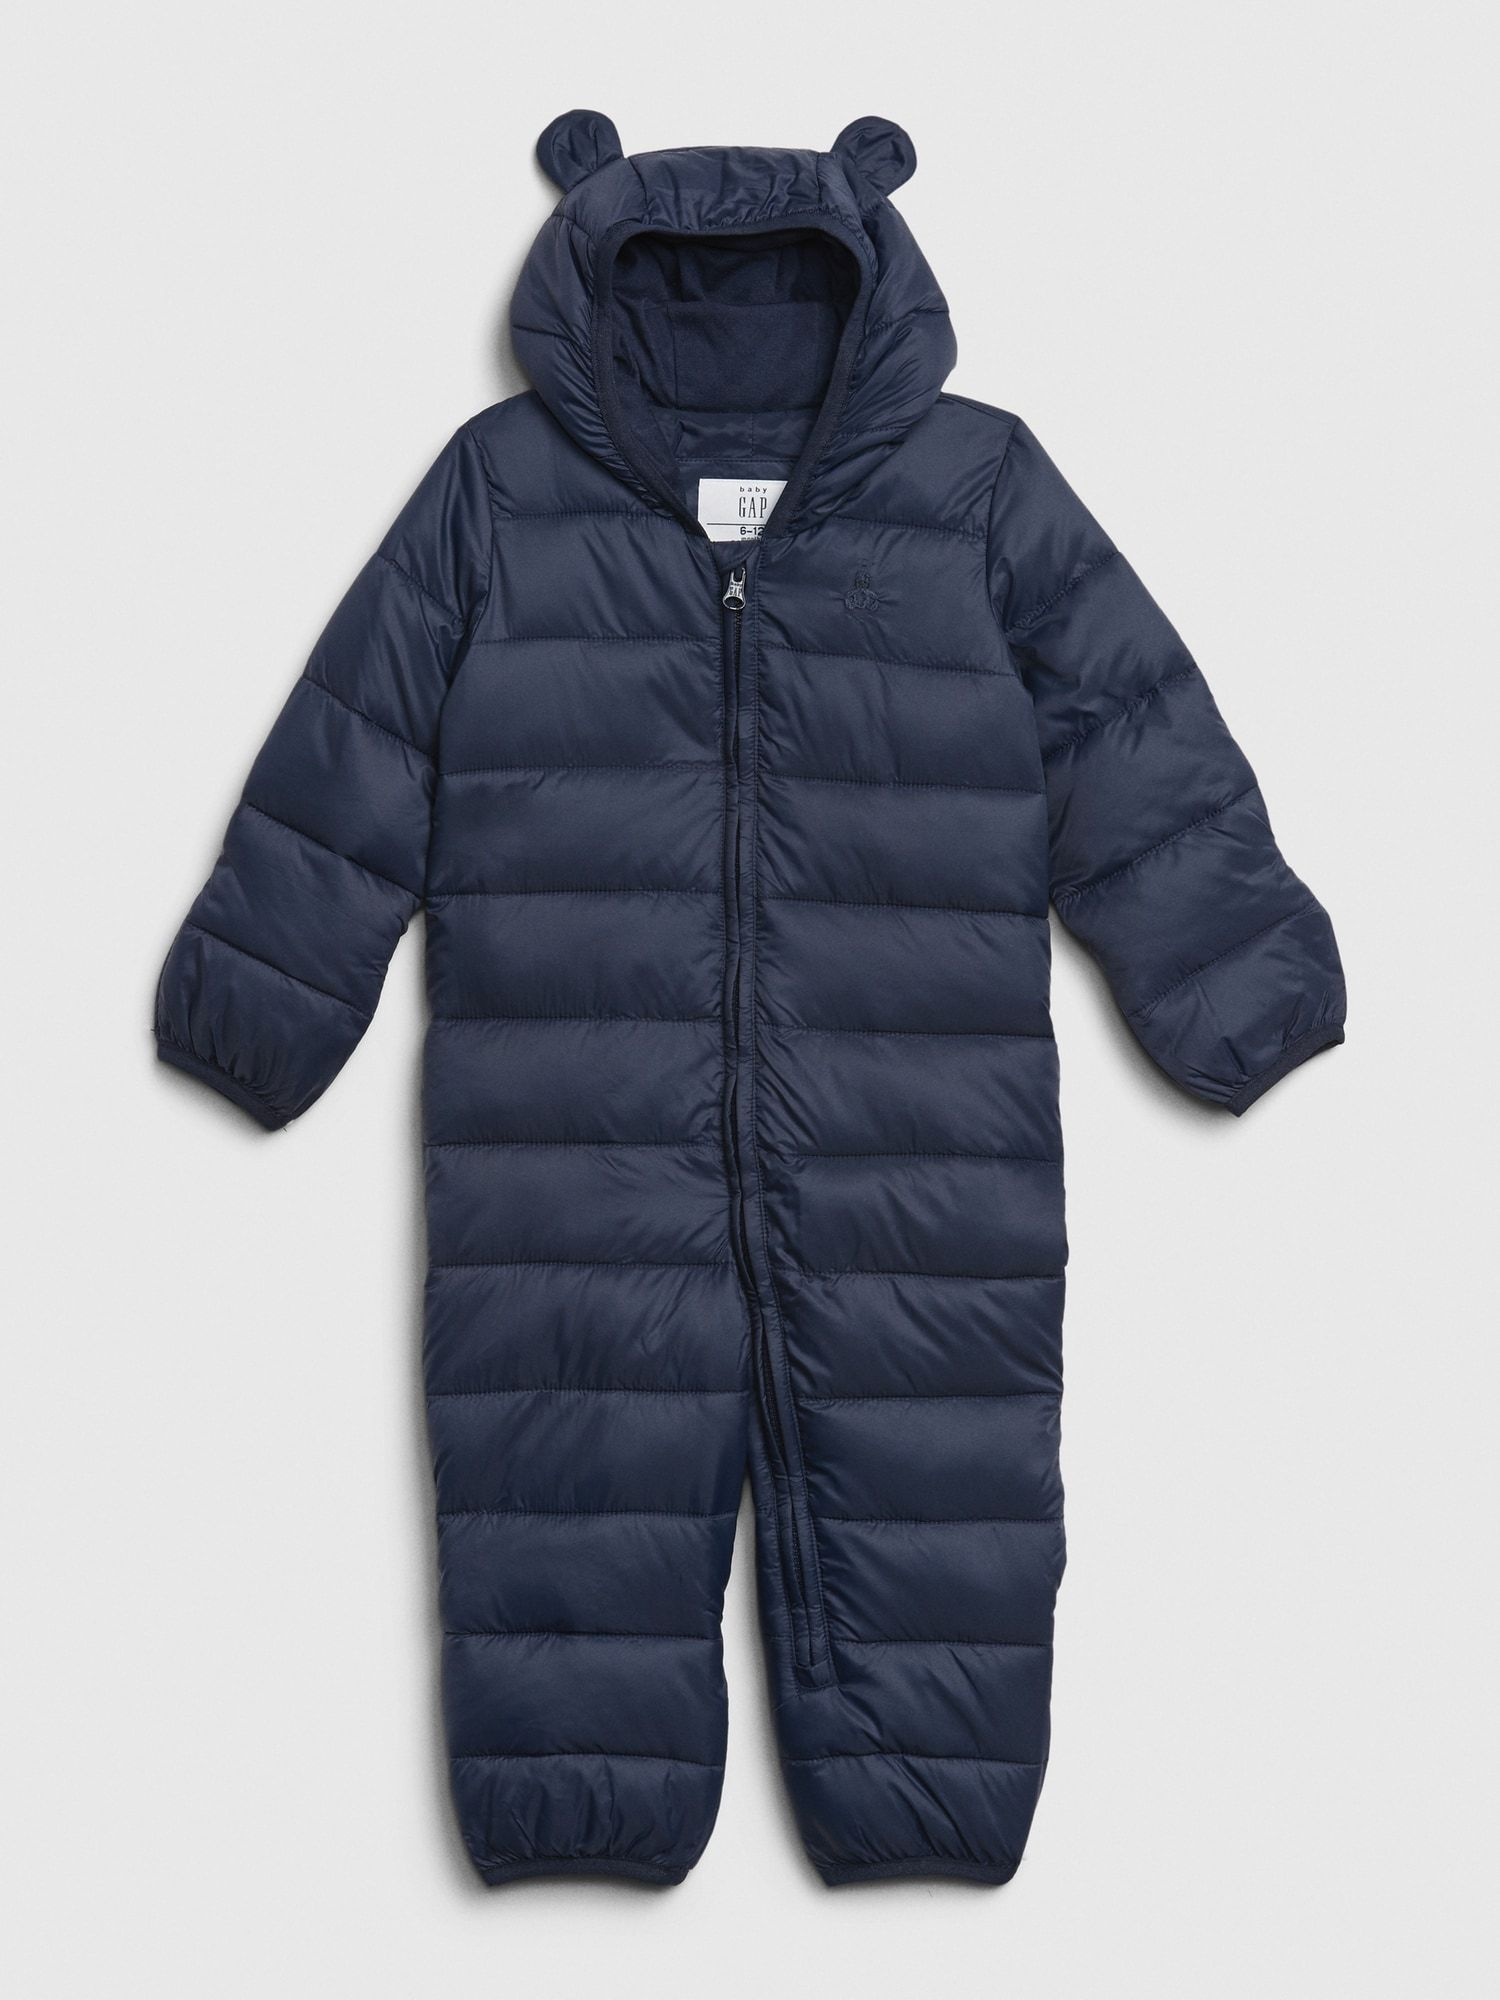 Baby Upcycled Lightweight Bundler Snowsuit Gap Snow Suit Baby Boy Coats Jackets Boy Outerwear [ 2000 x 1500 Pixel ]